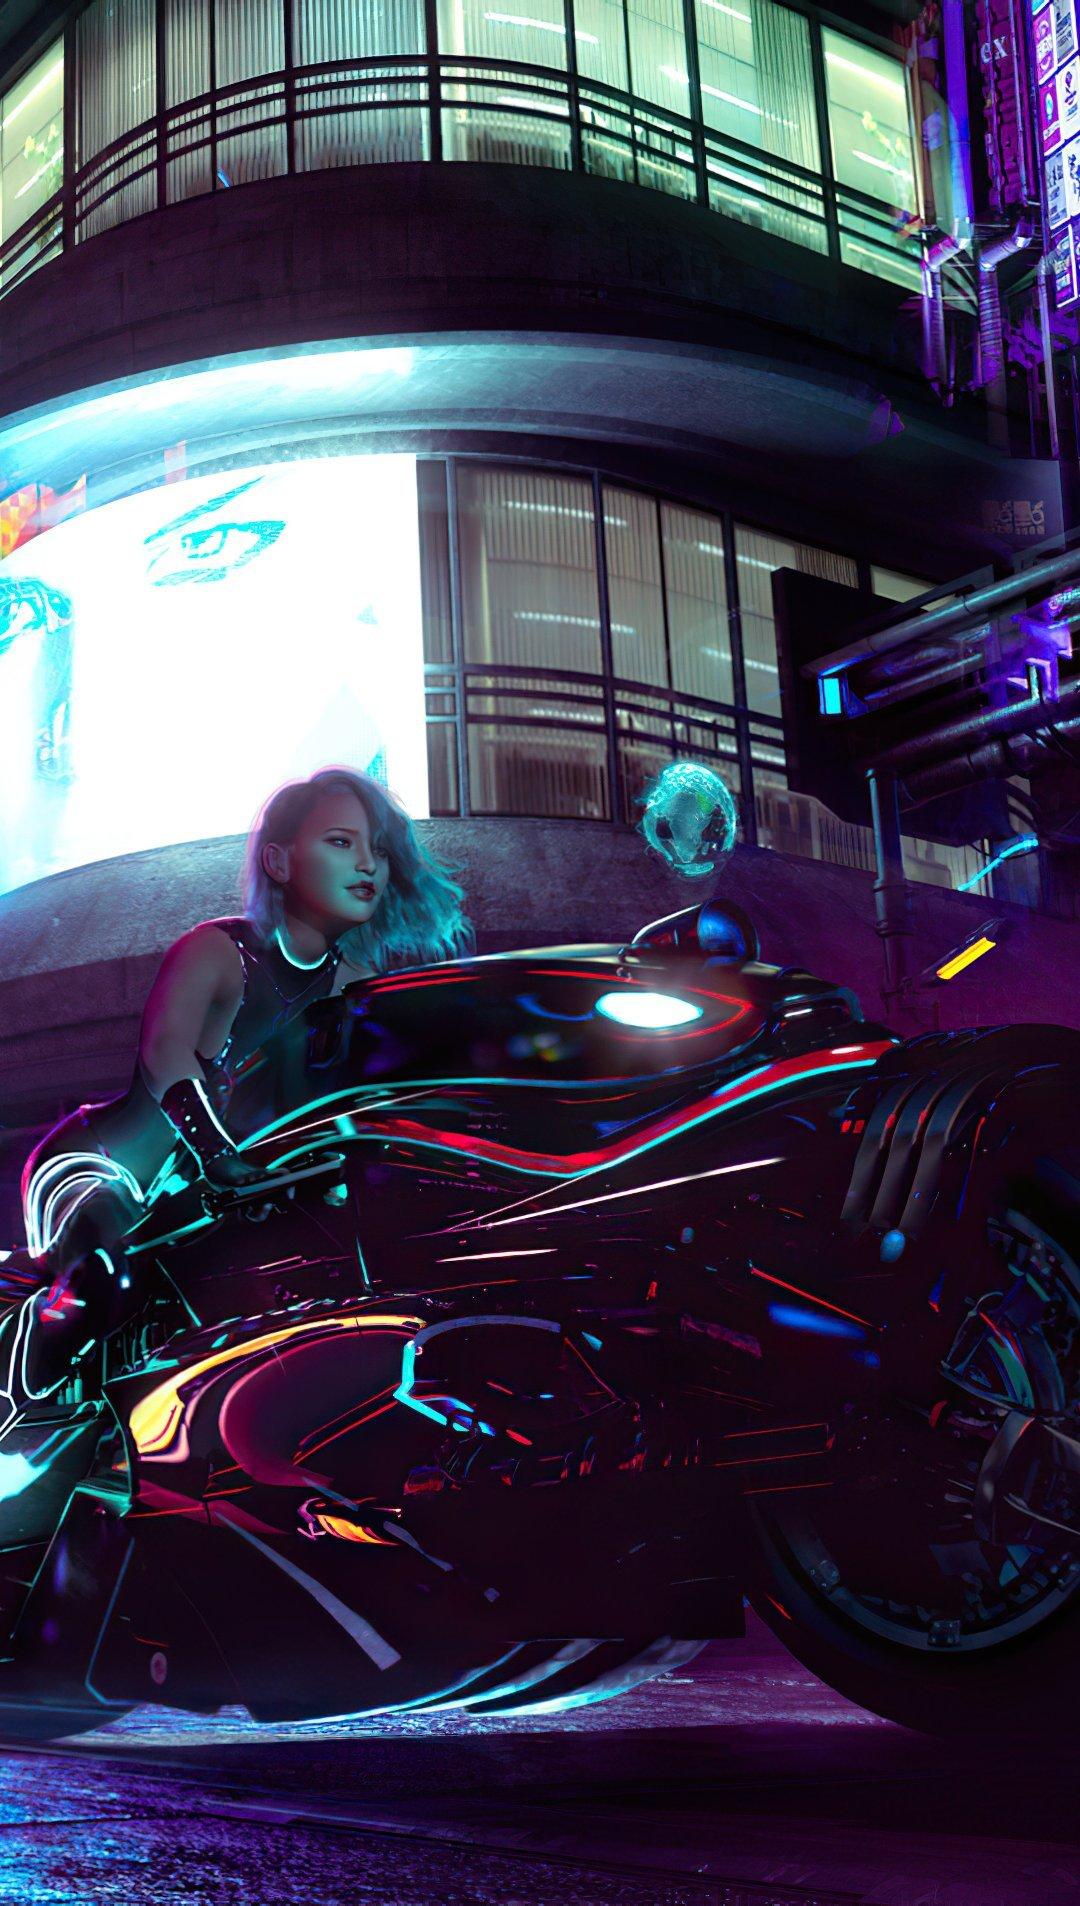 Wallpaper Cyberpunk Girl with bike Vertical